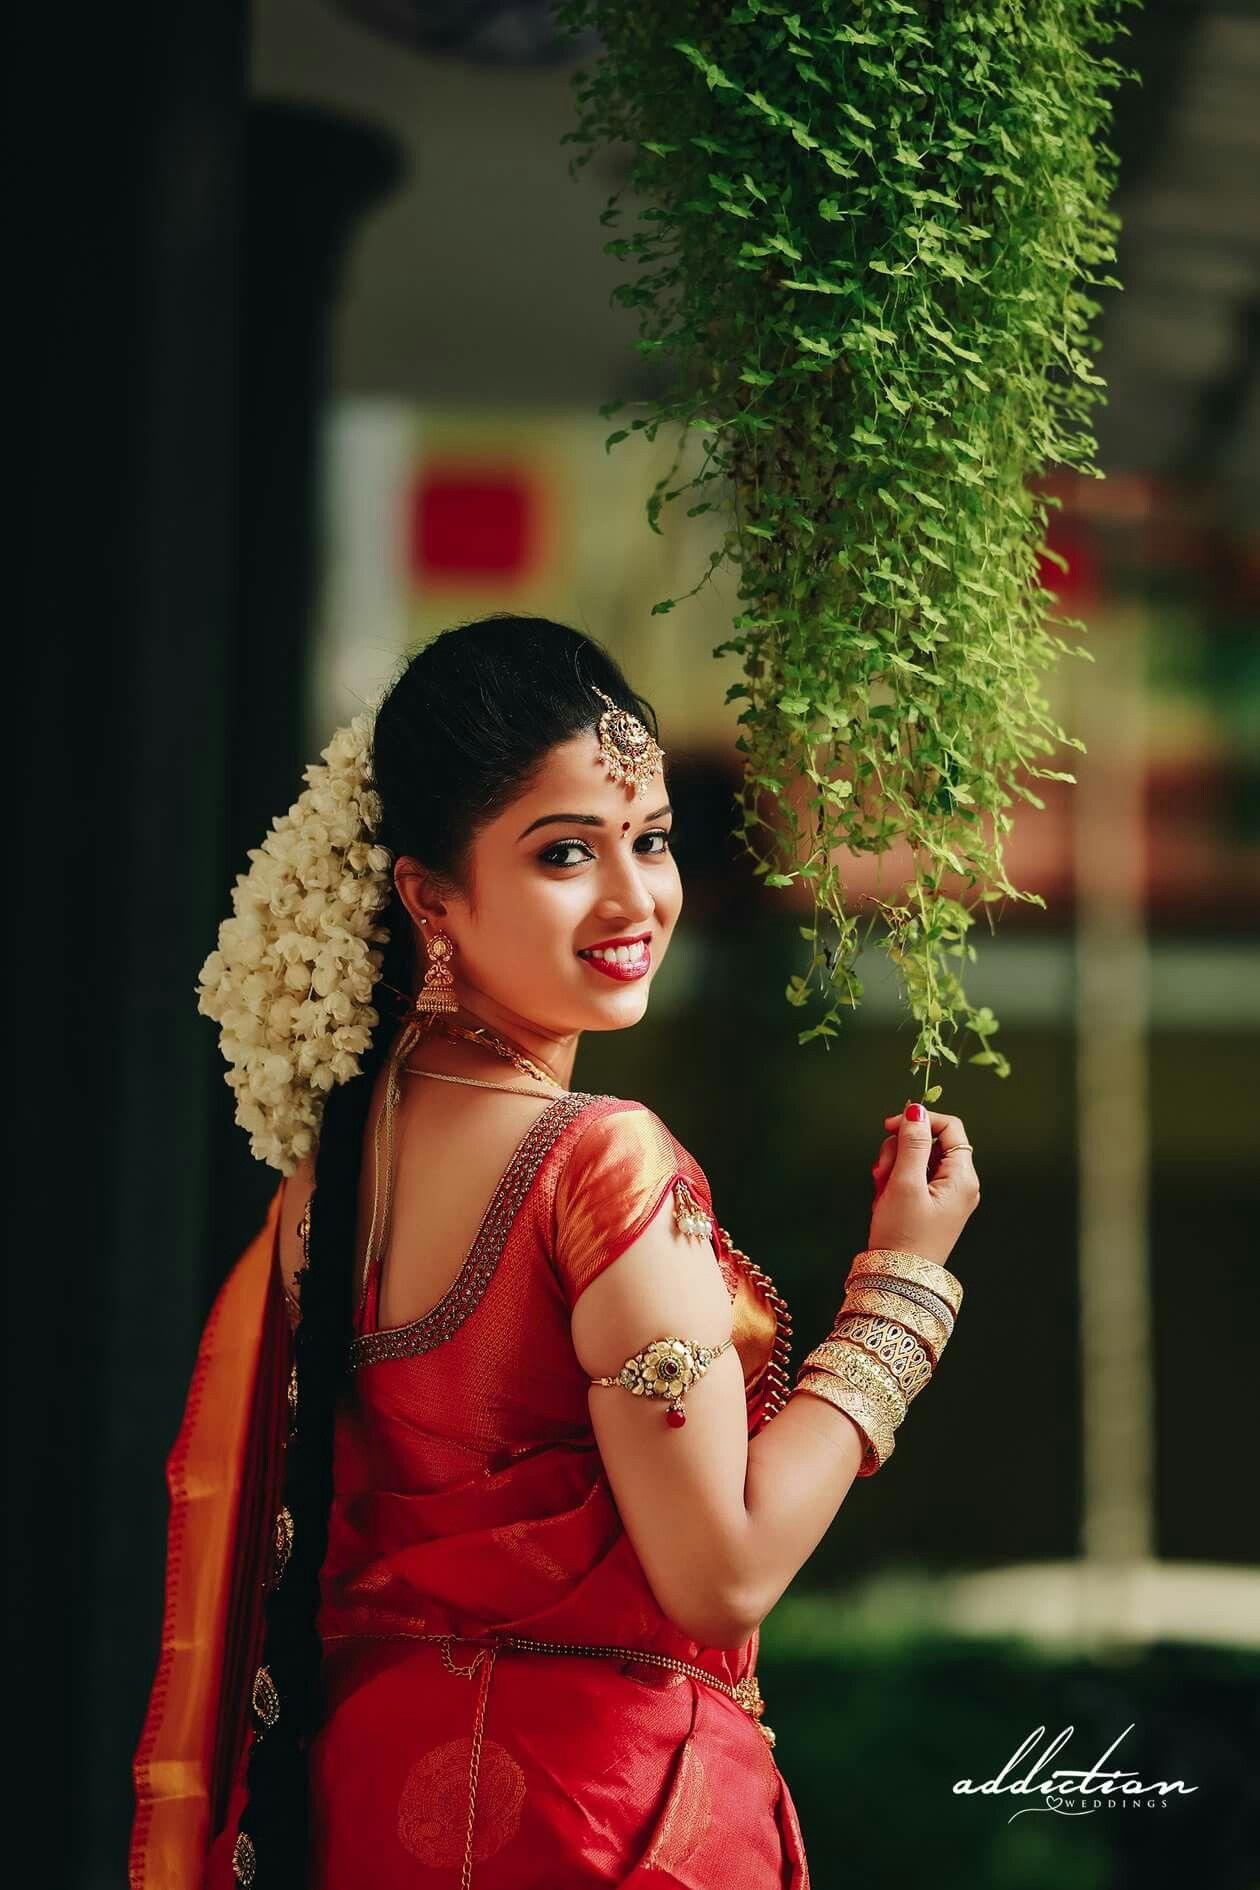 pin by almeena on klicks in 2019   kerala wedding